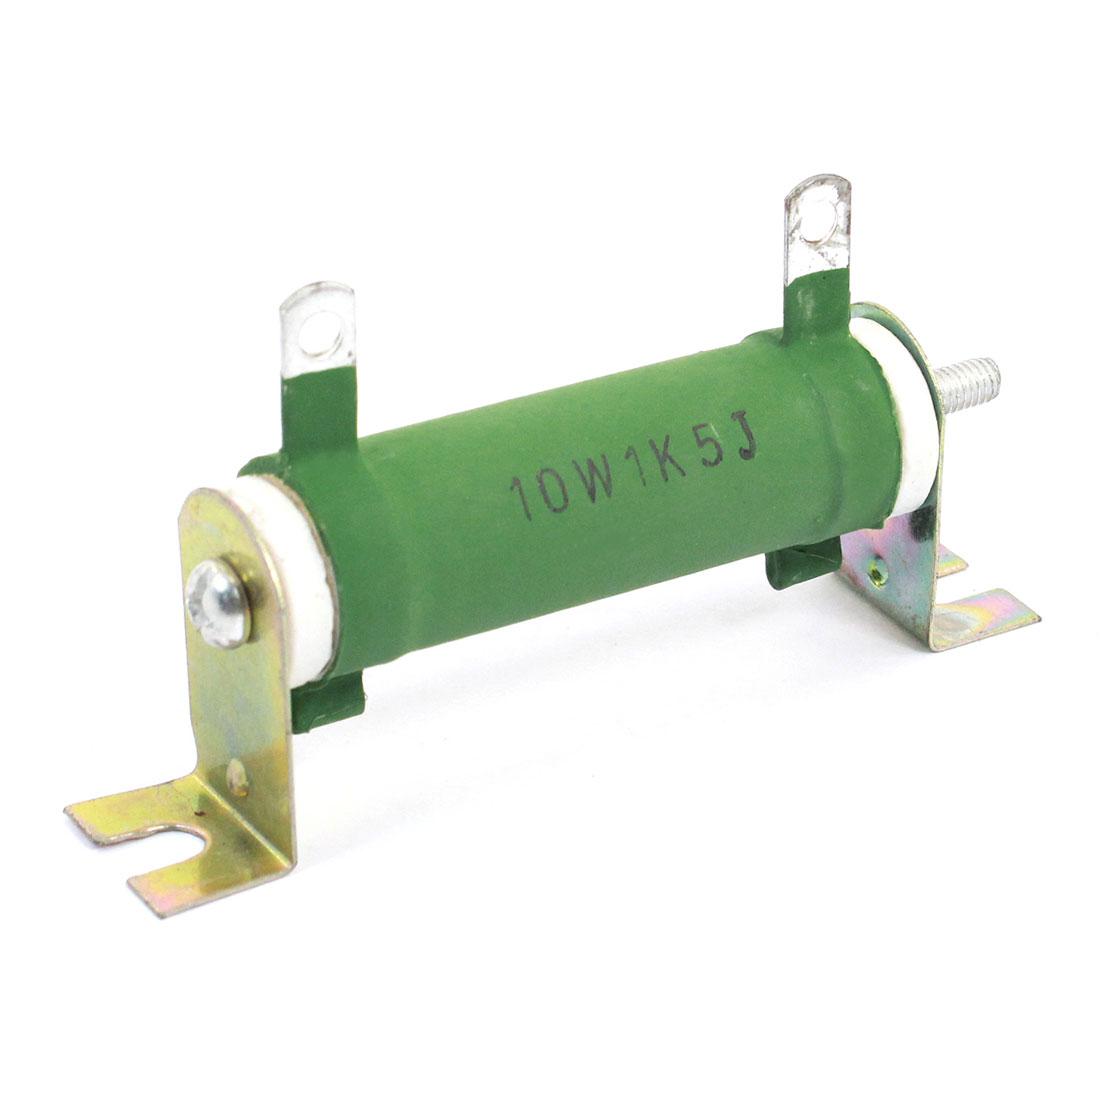 10W 1000 Ohm Resistance Wirewound Resistor Green